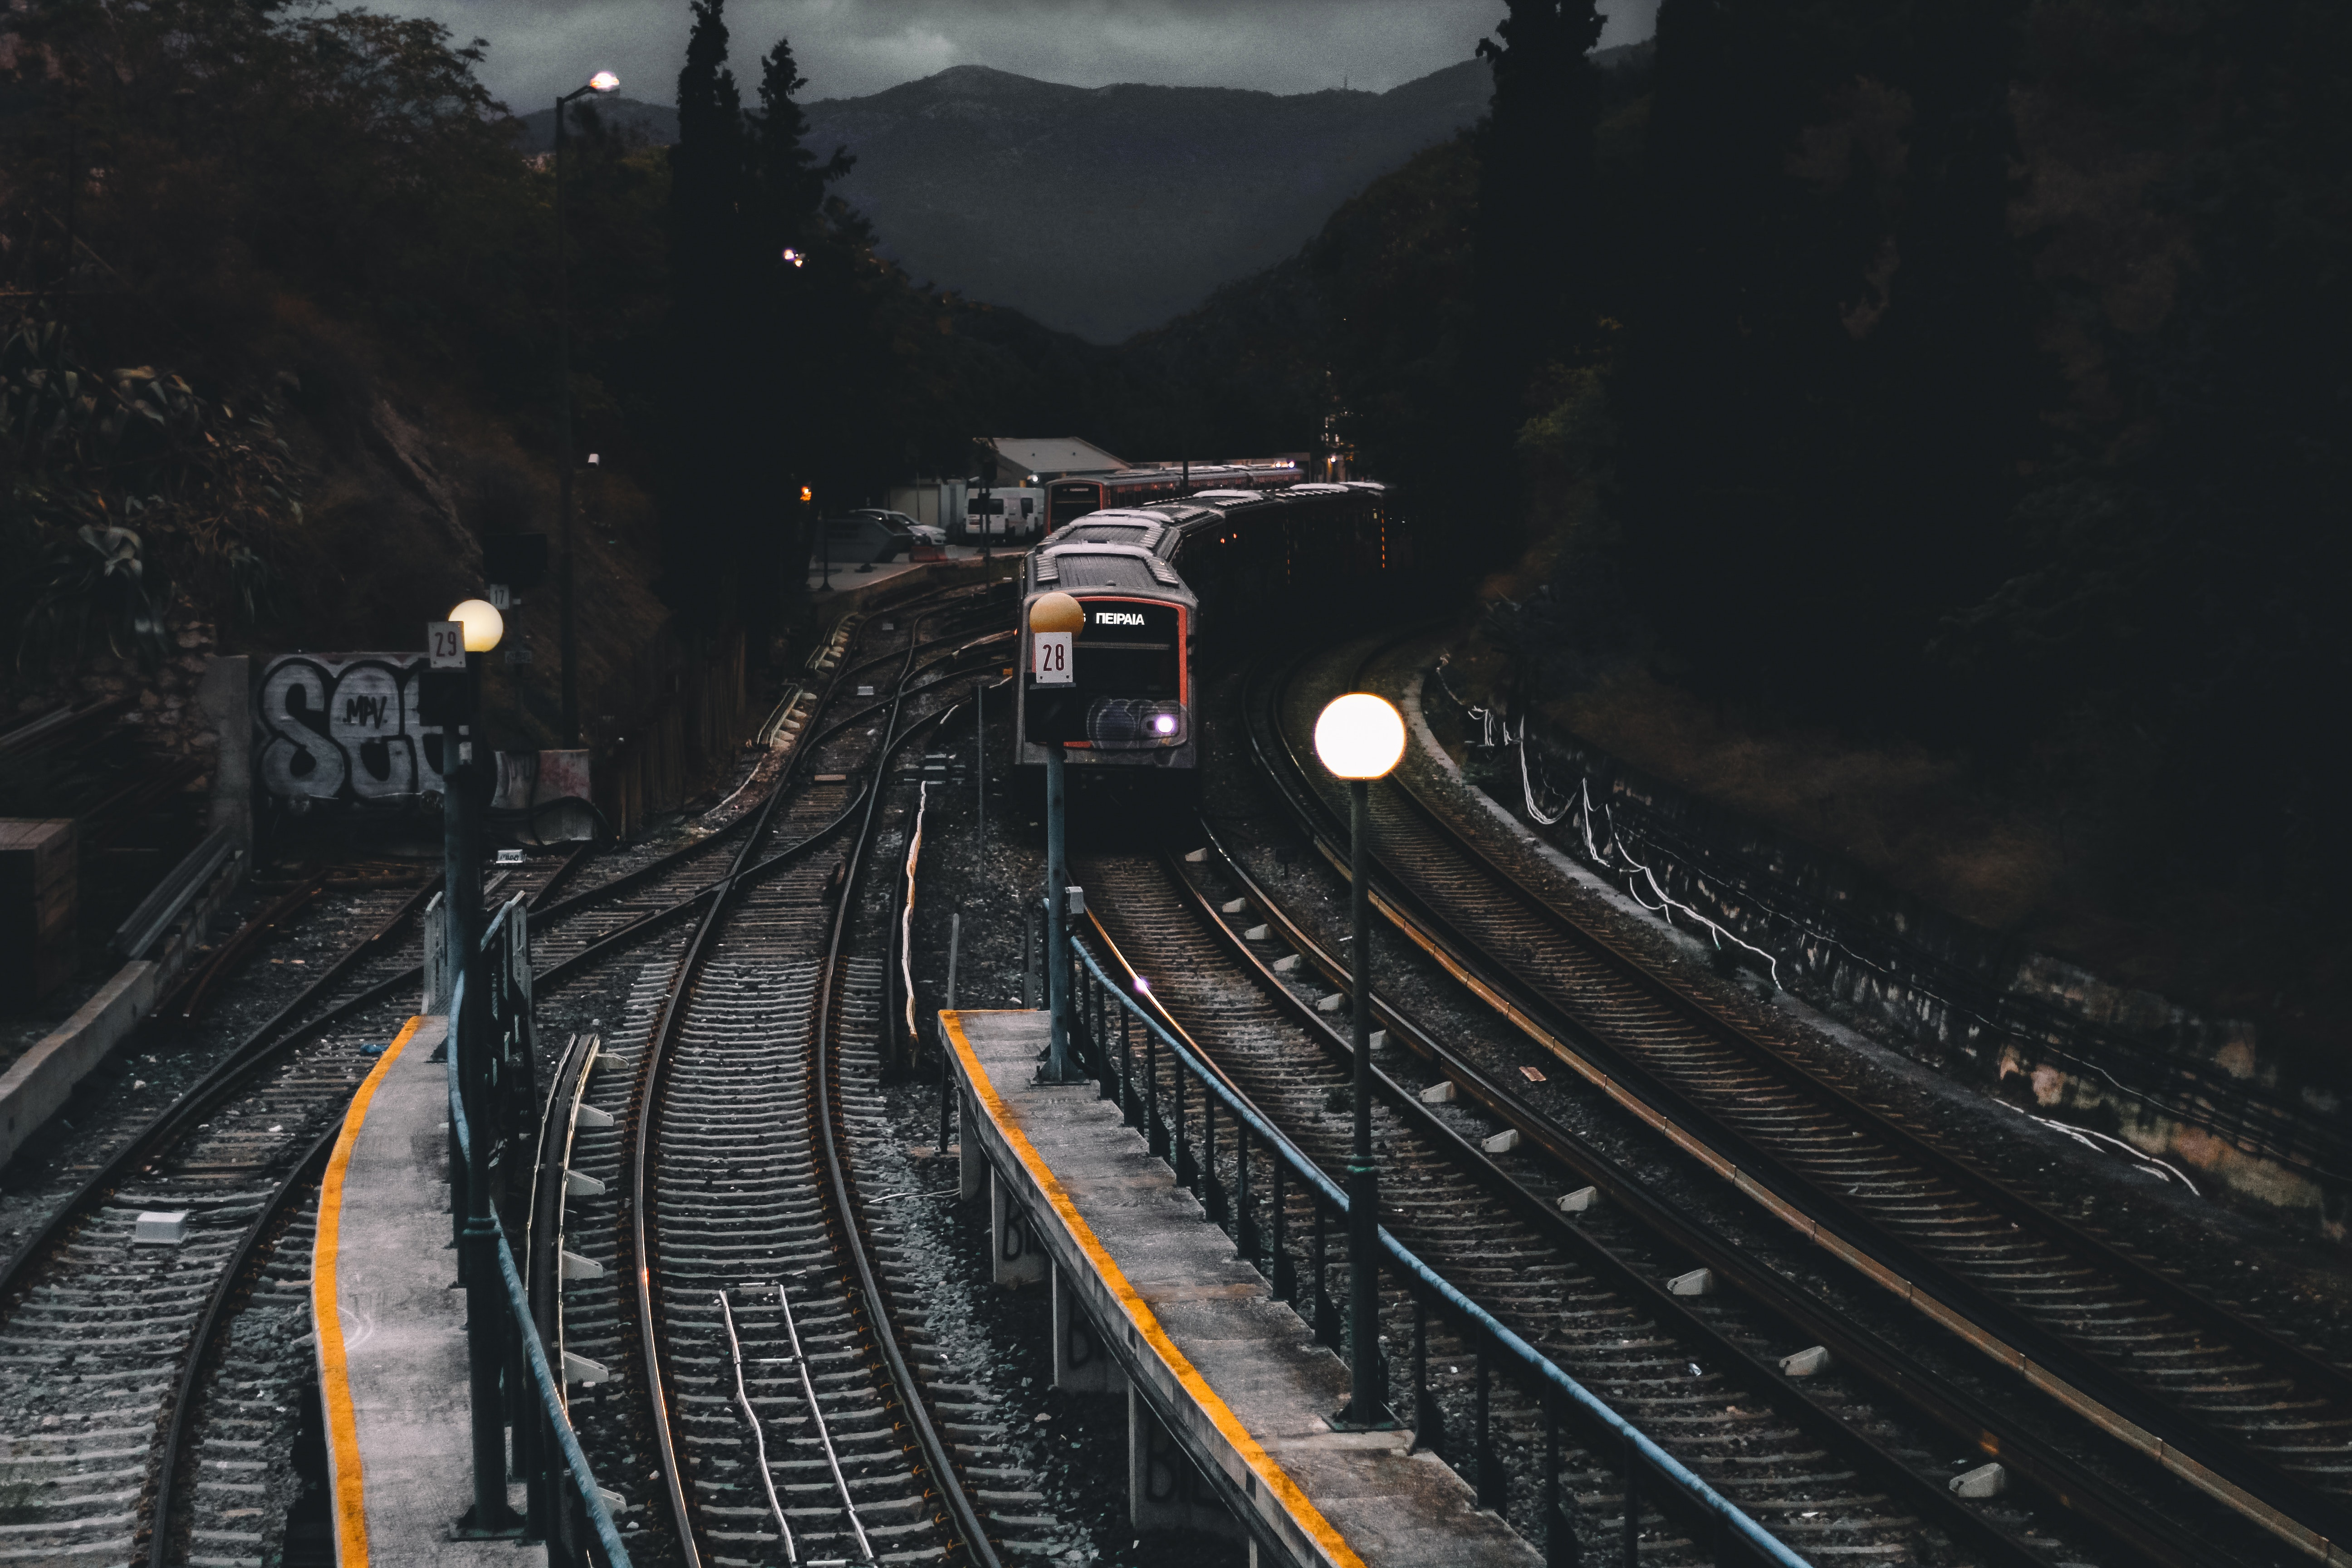 Train on railways during nighttime photo